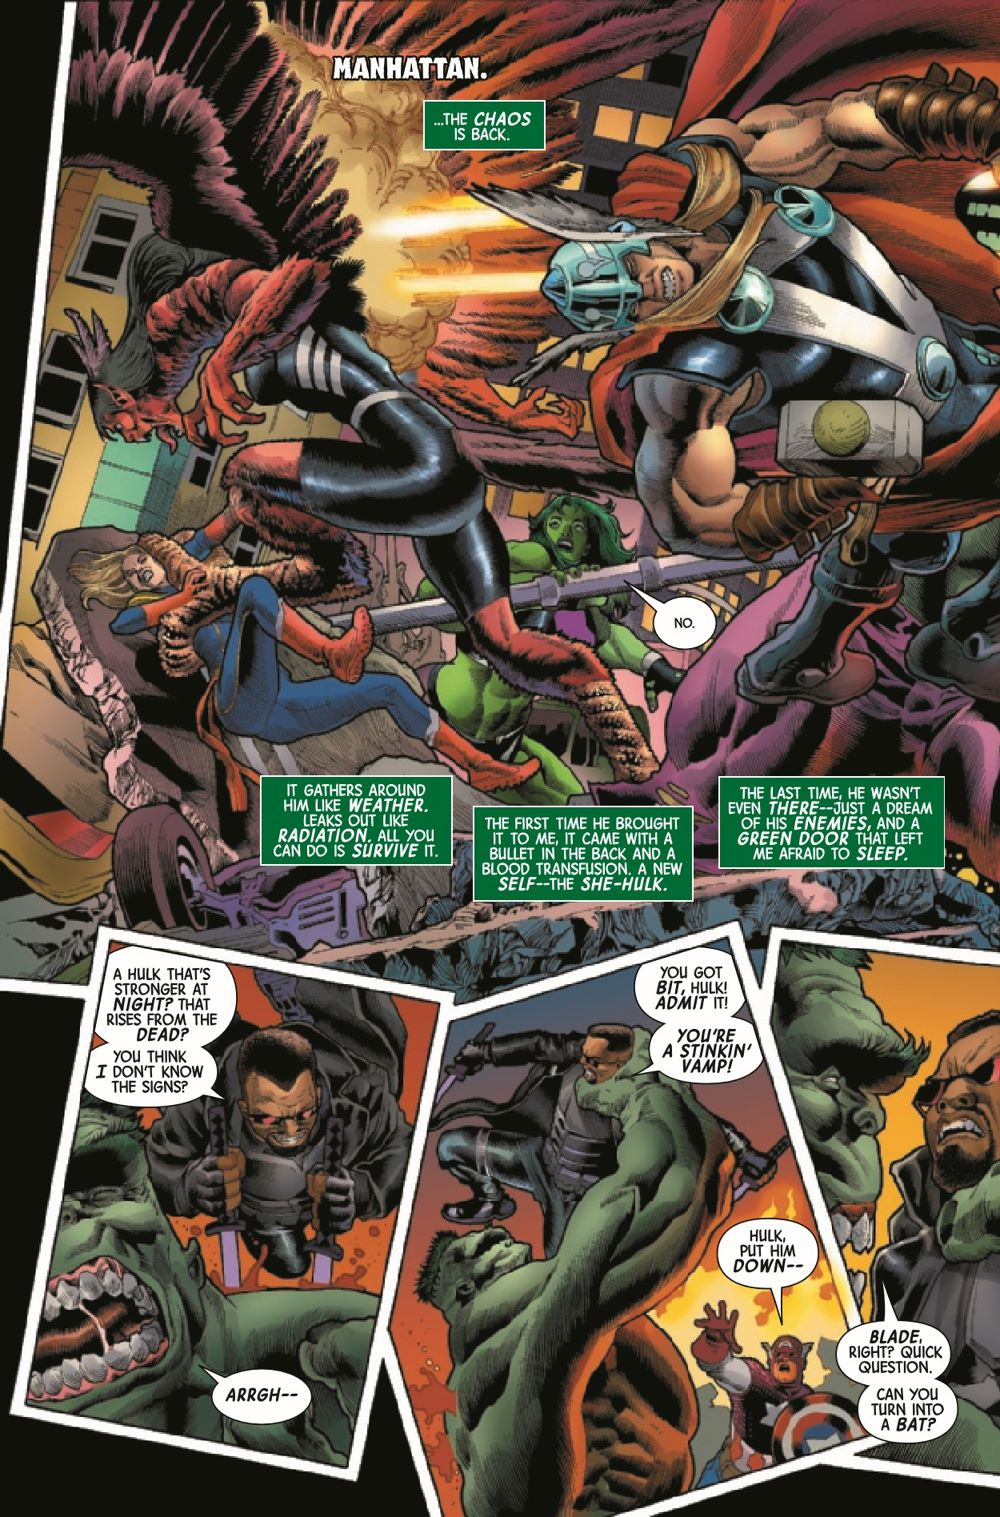 HULK2018047_Preview-3 ComicList Previews: THE IMMORTAL HULK #47